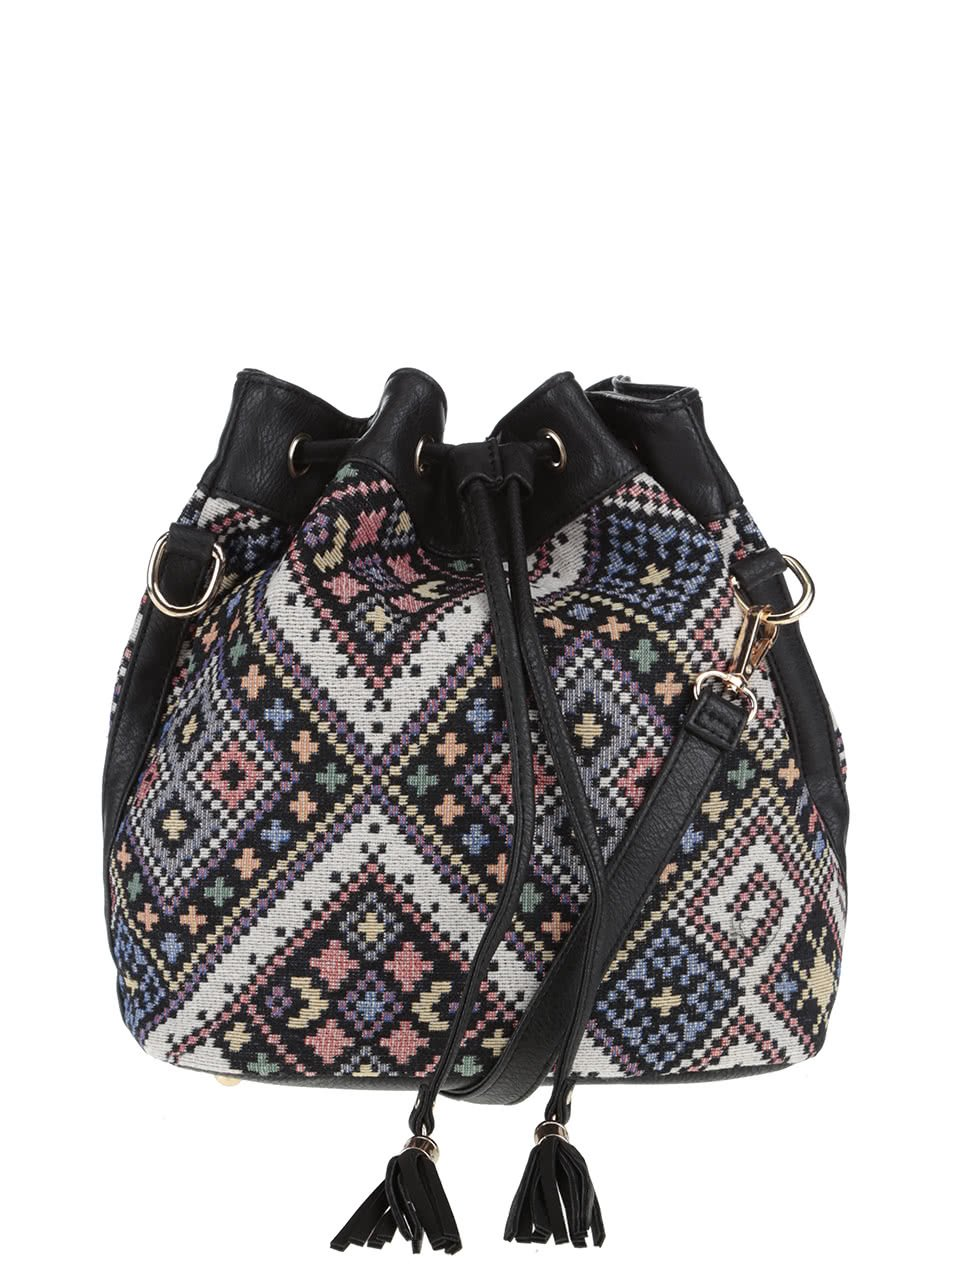 Černá crossbody kabelka s barevným vzorem Haily´s Lara